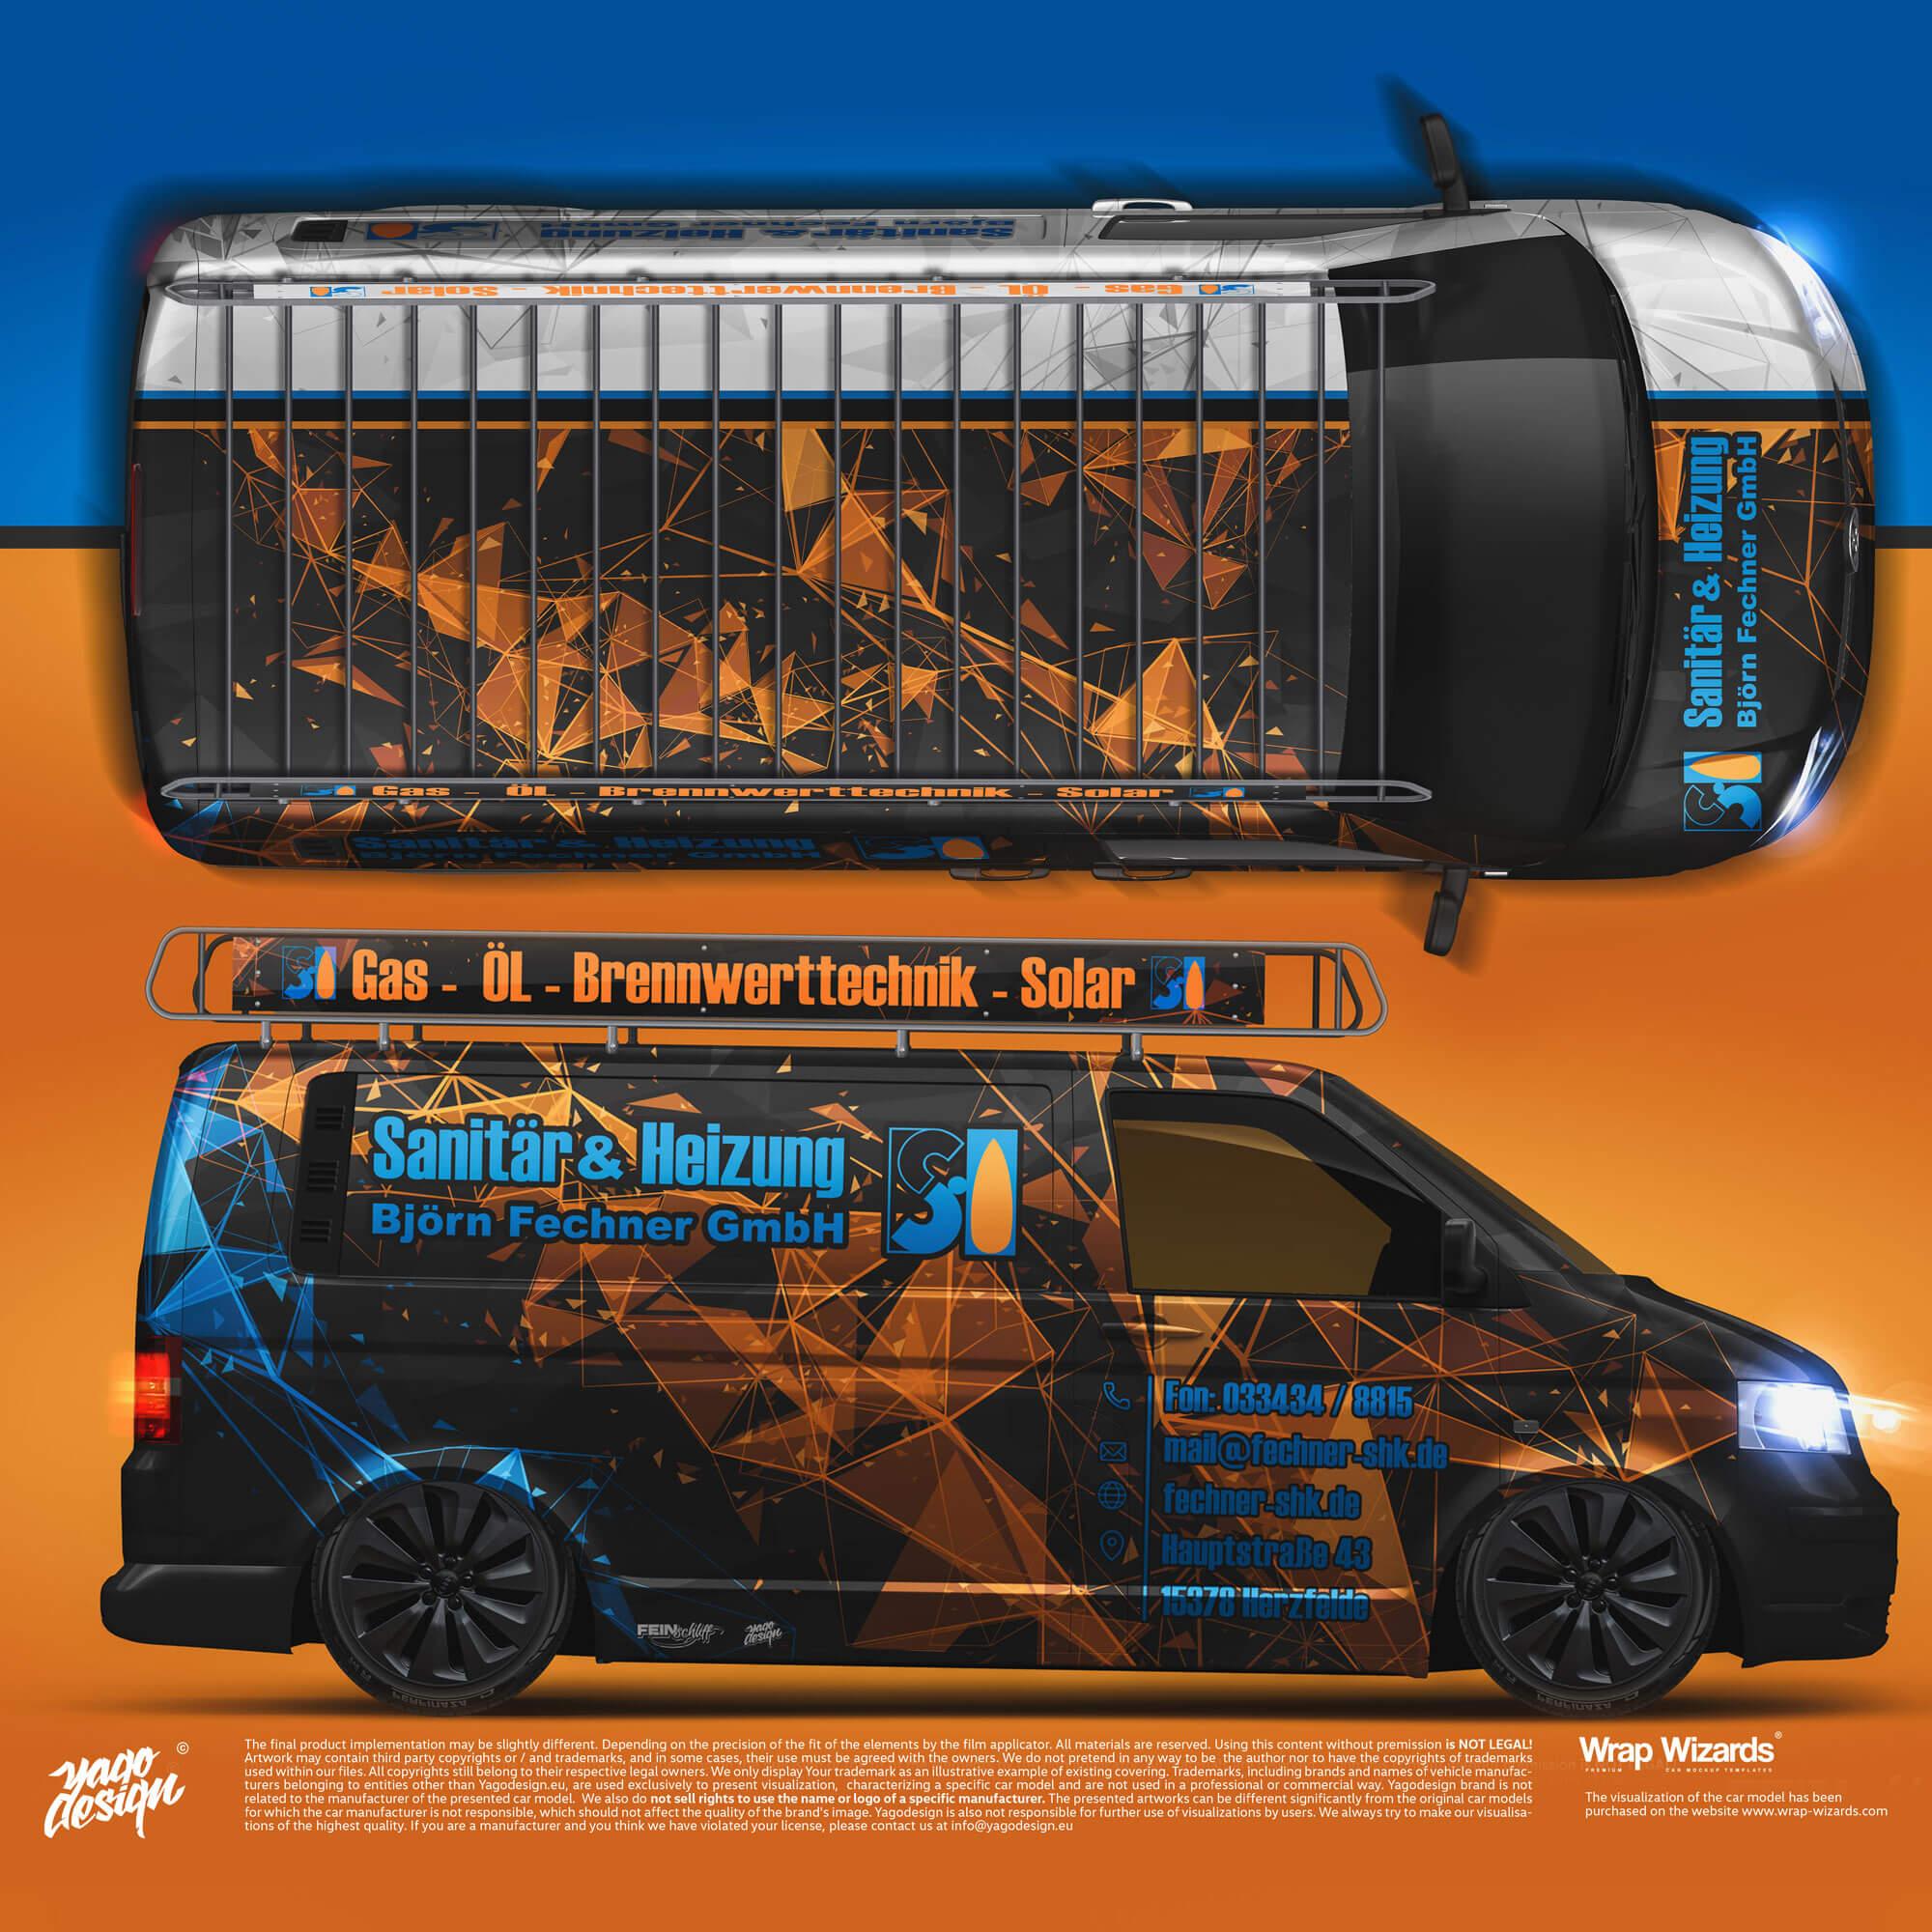 Volkswagen-Transporter-T5-Carwrapping-Design-Studio-side-top-1